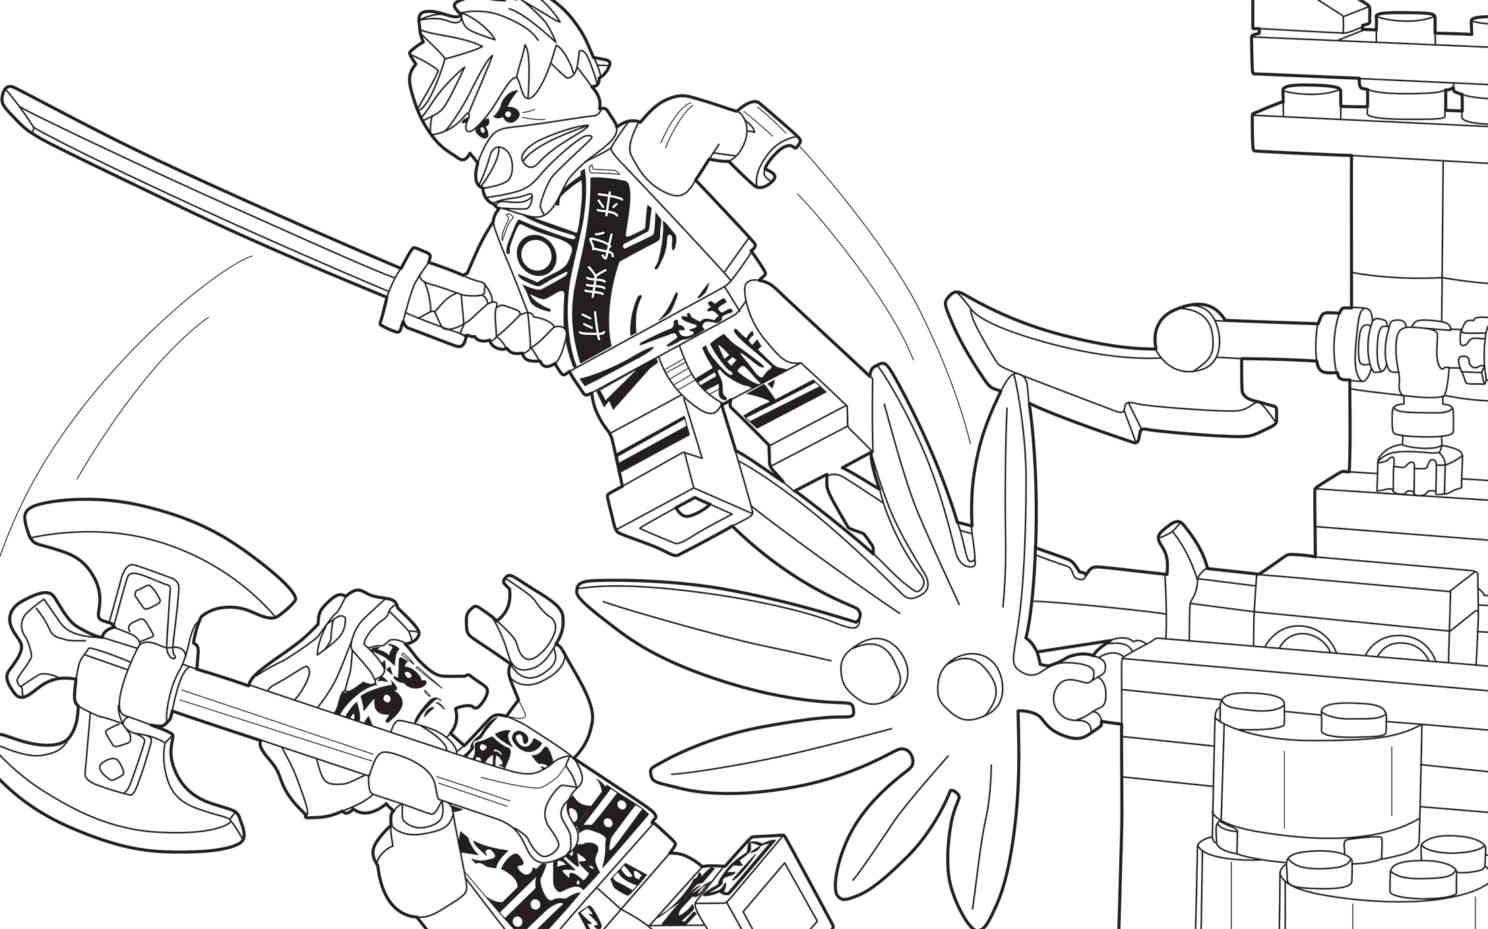 Lego Ninjago Master Chen Coloring Page Printable Sheet Lego Ninjago Desenhos Minecraft Minecraft Desenho